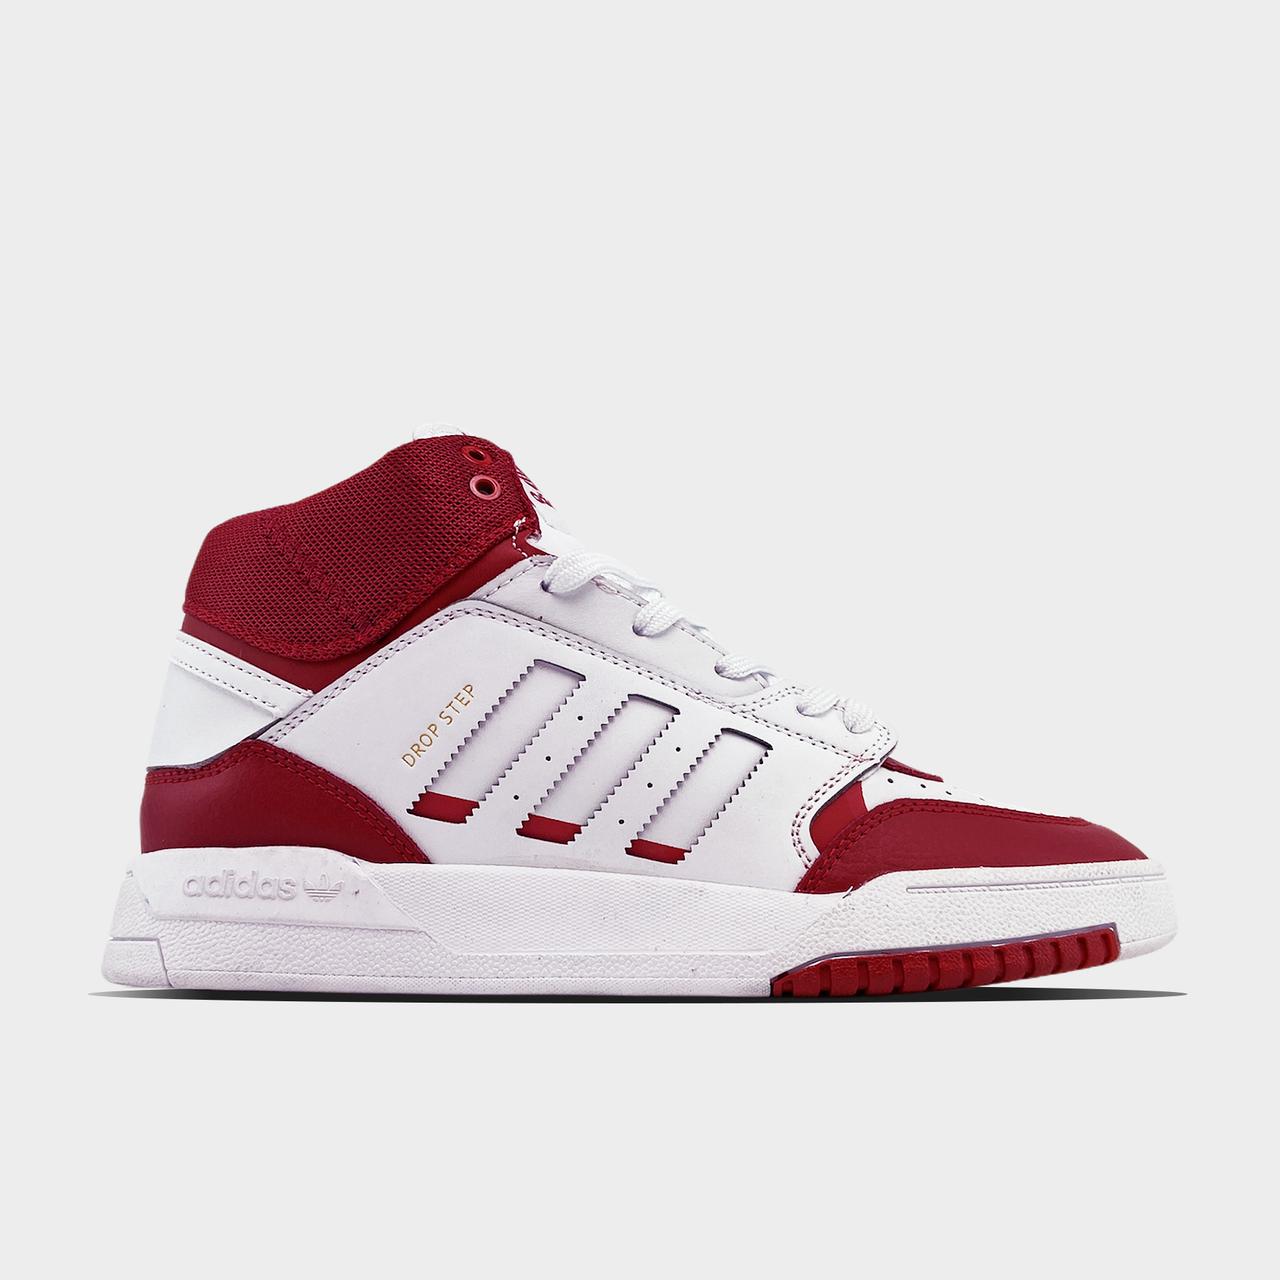 Adidas Drop Step Red White (Белый Красный)